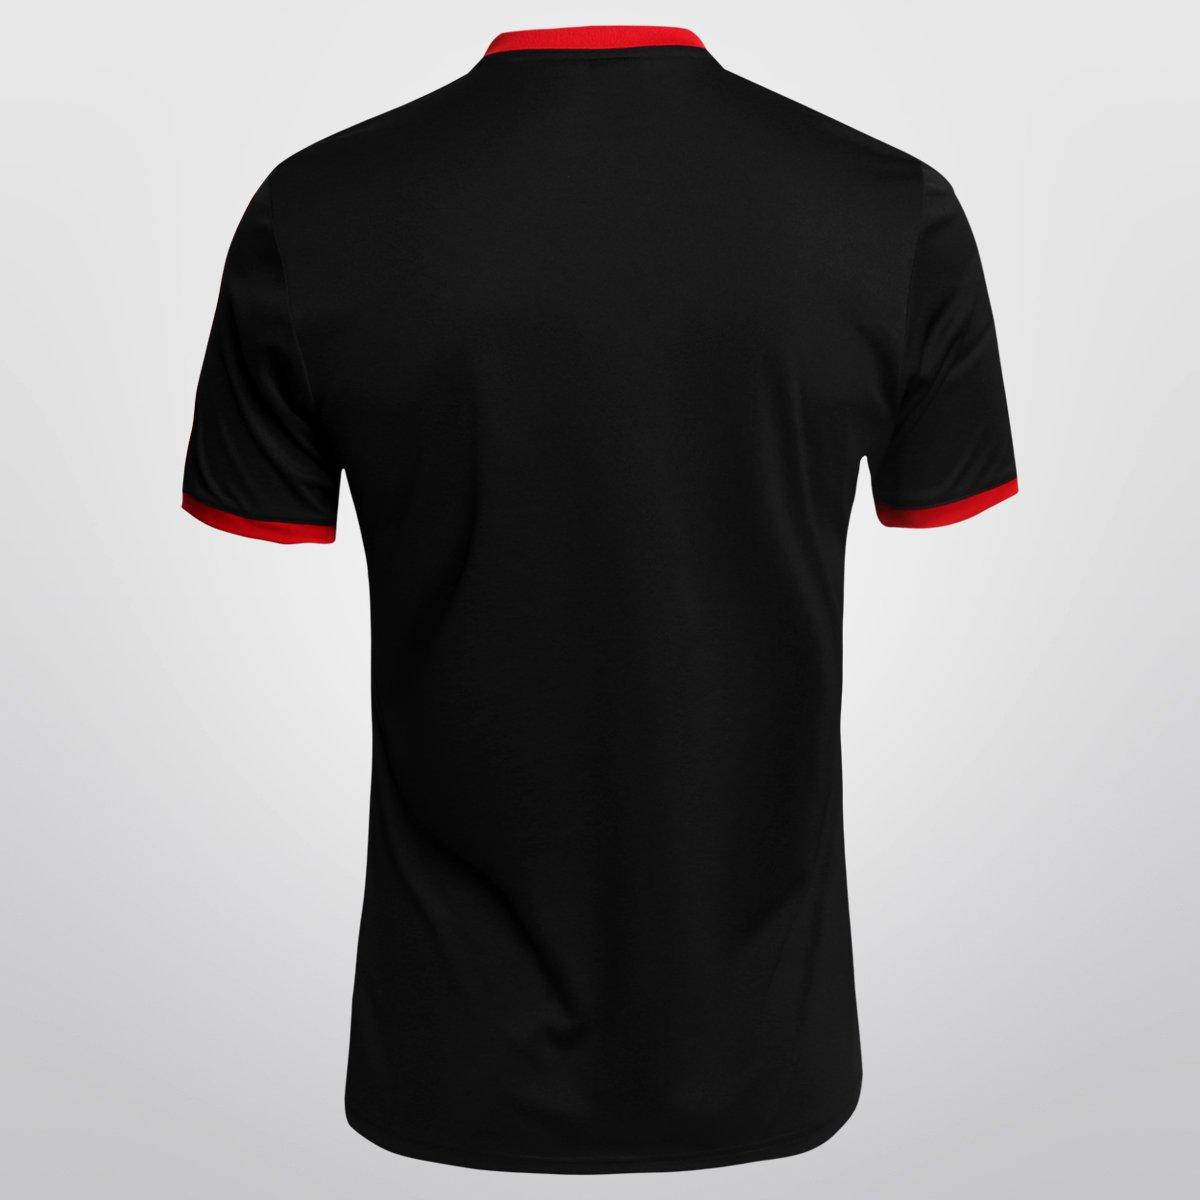 9724703ba5 Camisa Adidas Tabela 14  Camisa Adidas Tabela 14